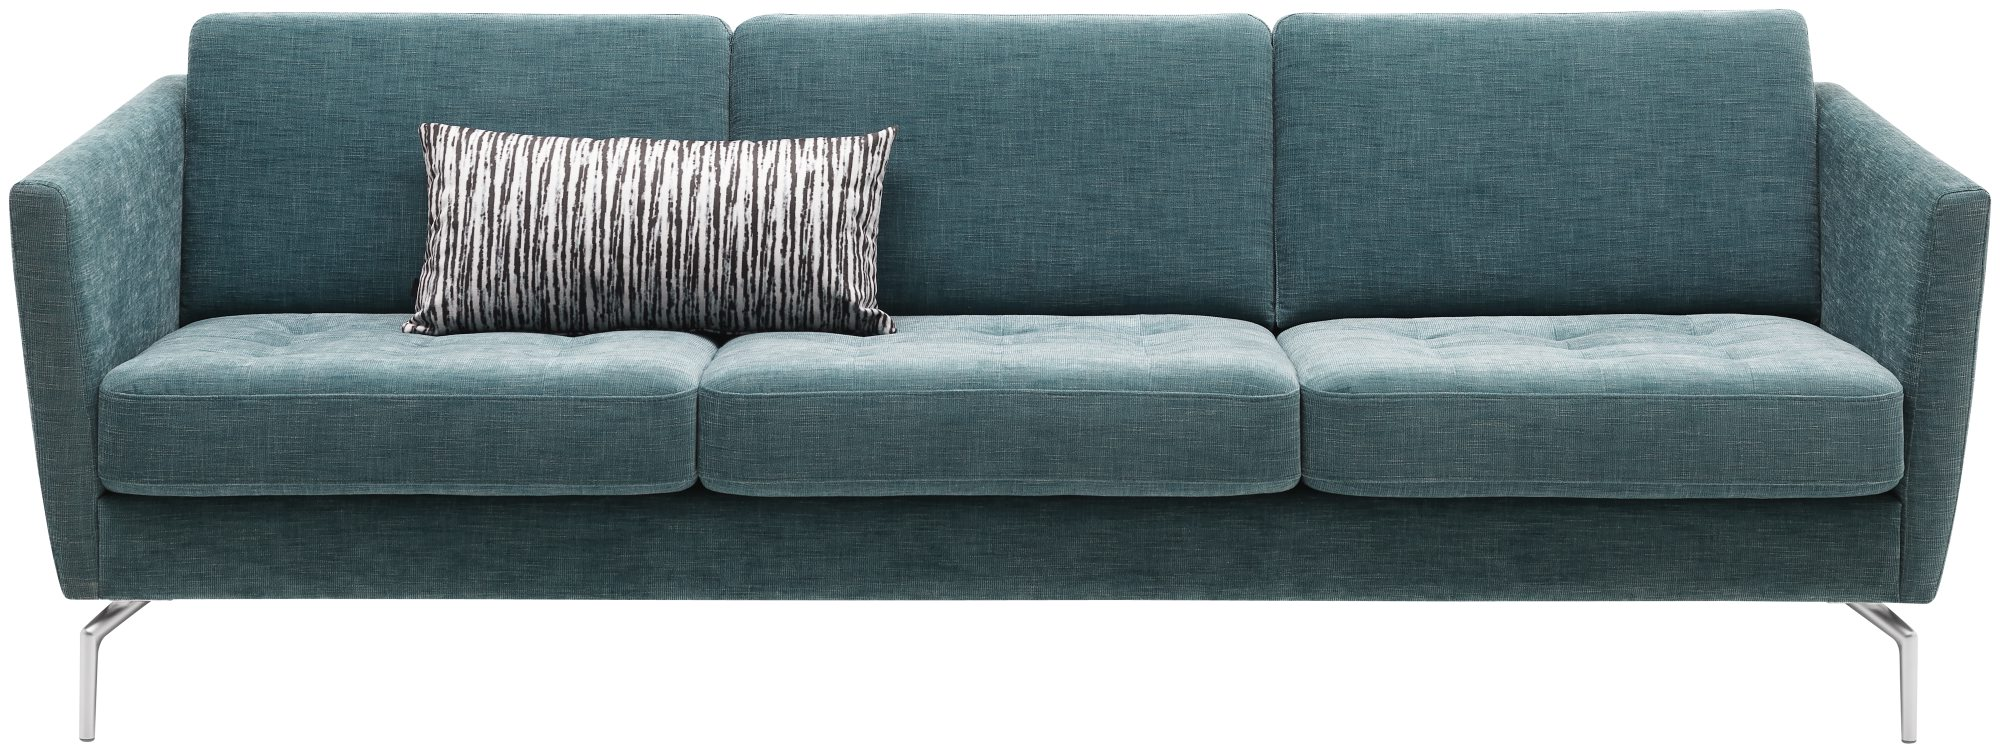 Tre-seter sofa, Osaka, i turkis tekstil Napoli, kr 17 604, Bo Concept.